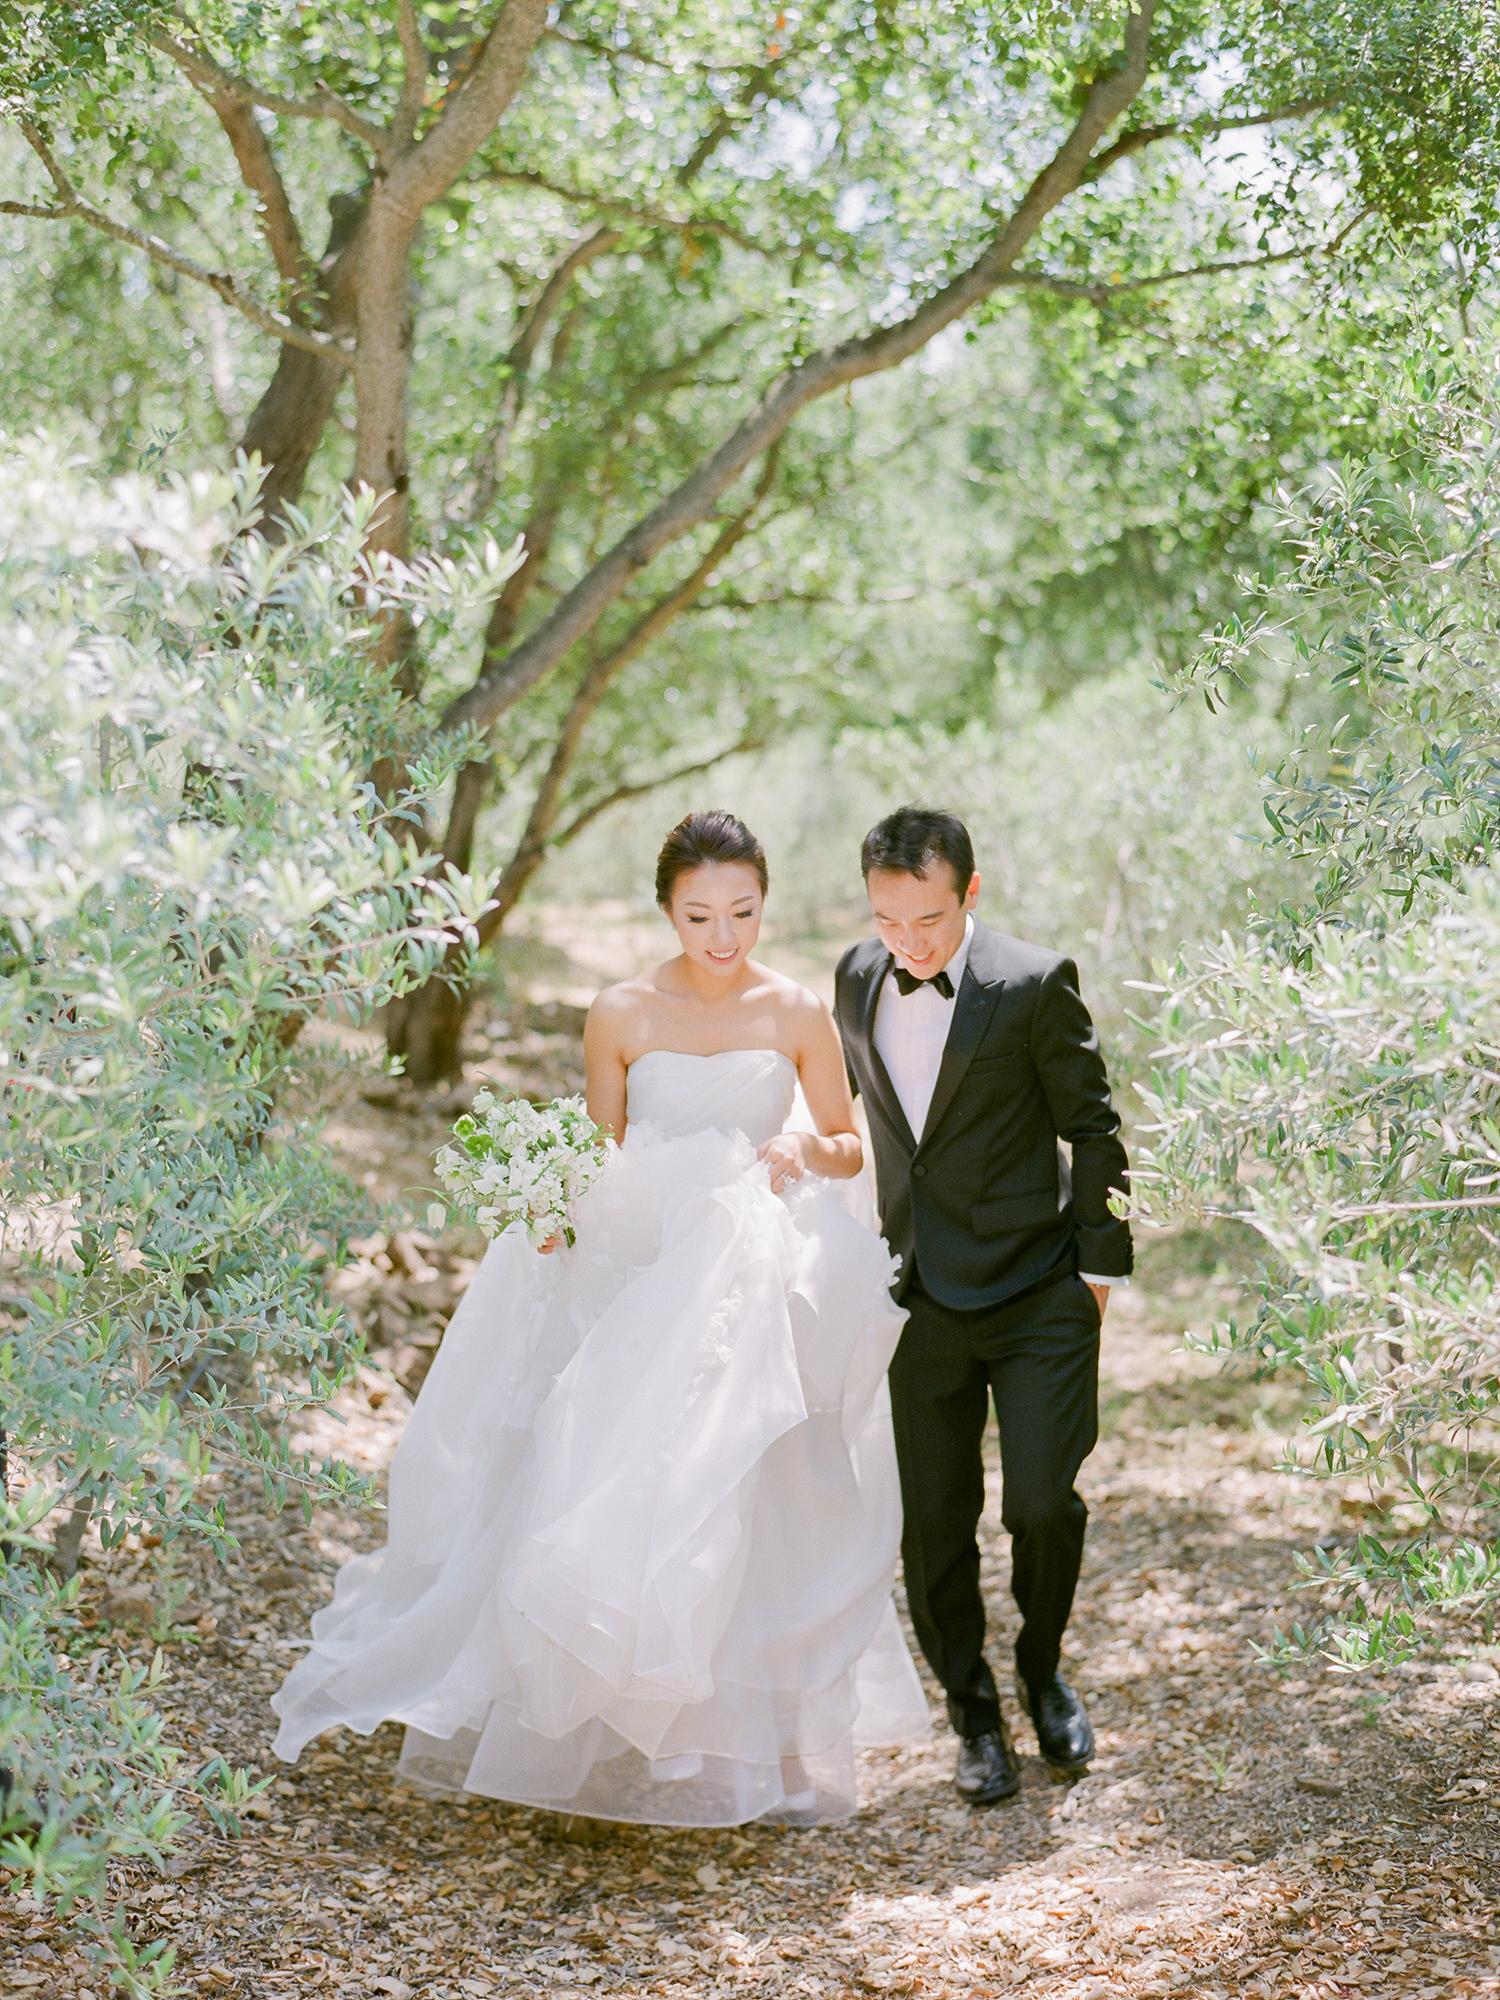 grace ceron wedding couple walking